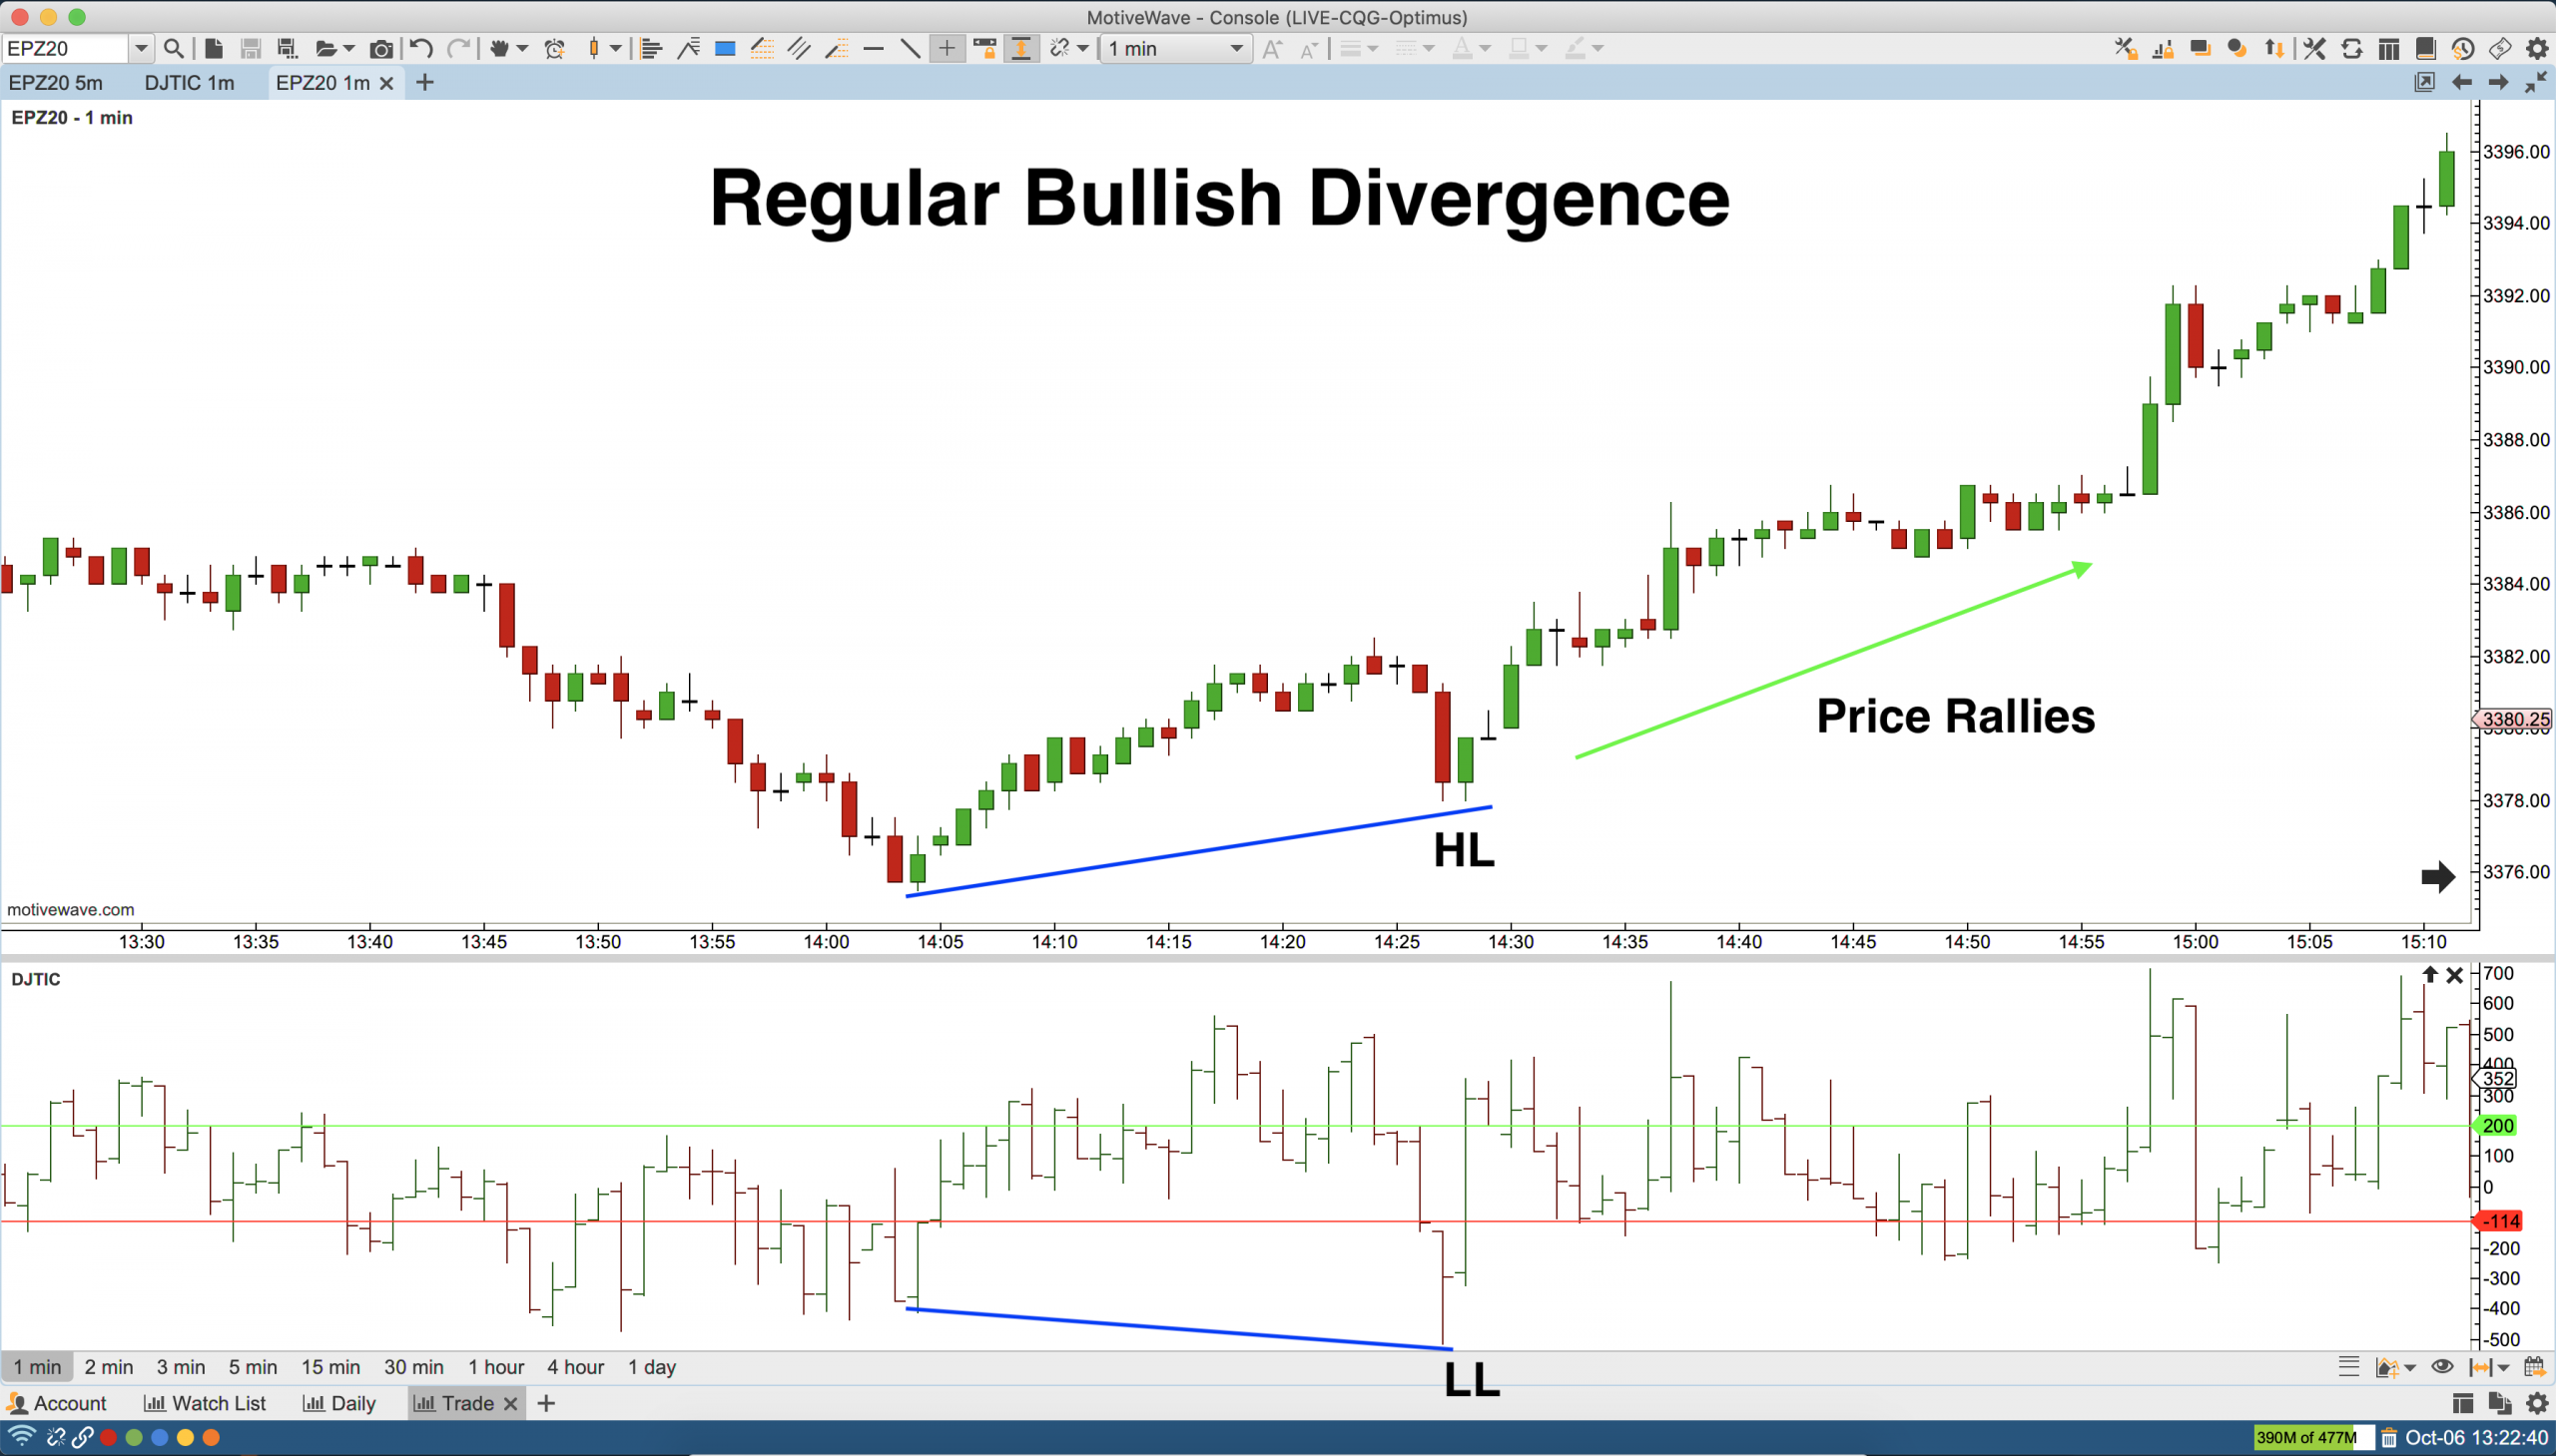 Regular Bullish Divergence NYSE Tick